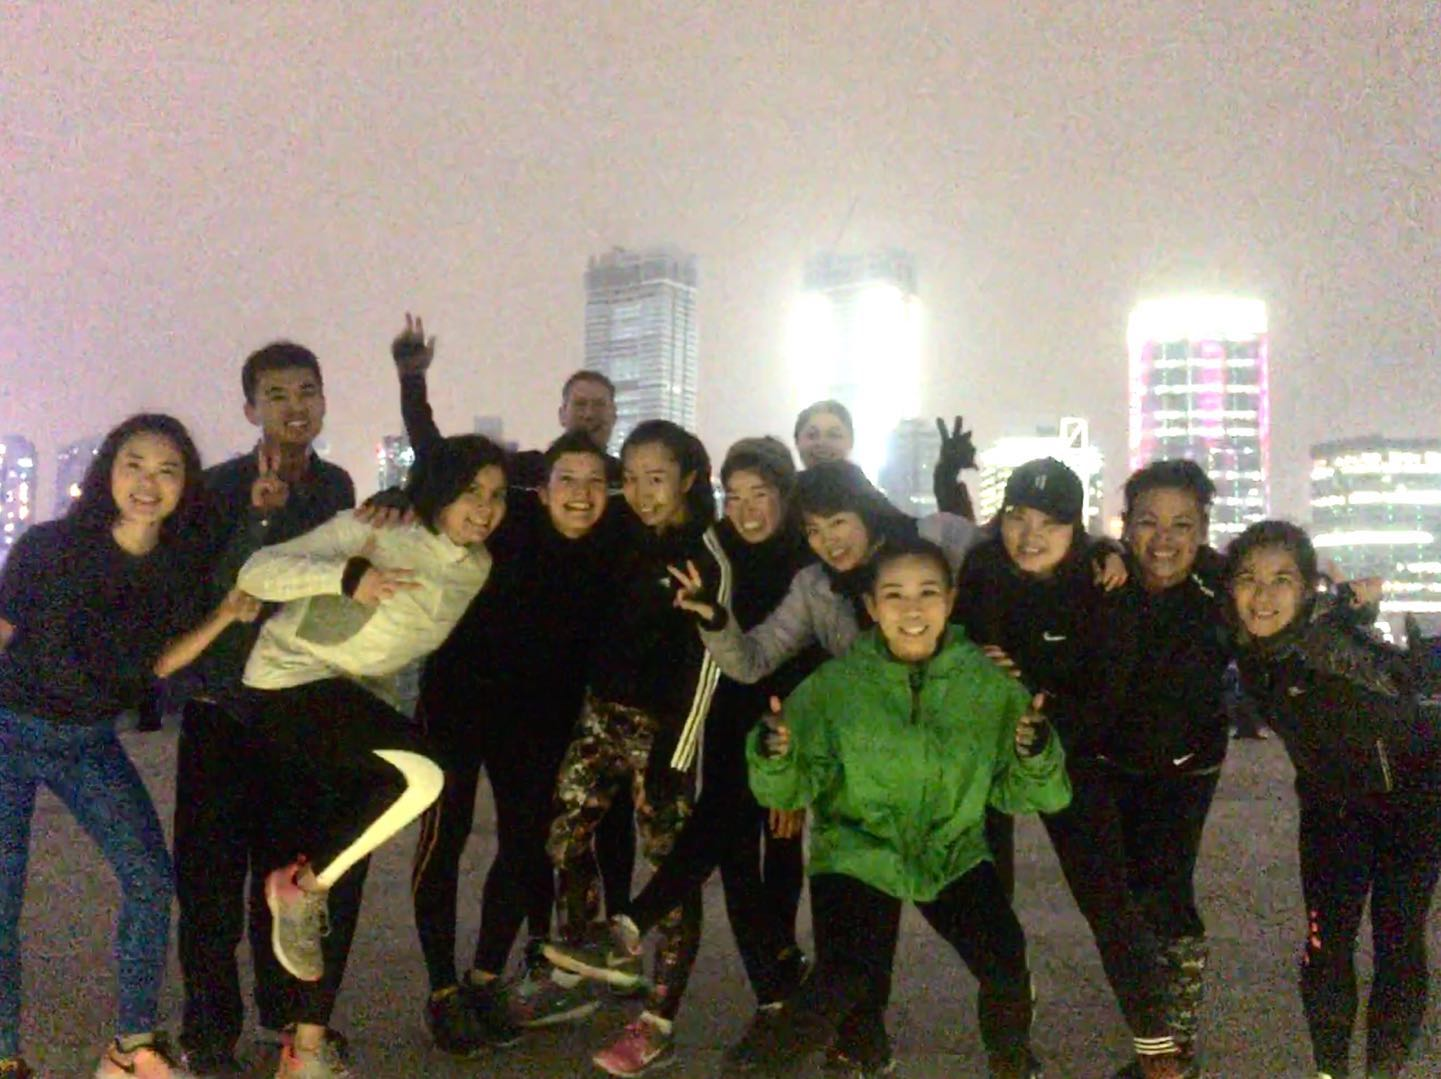 08_Pudong Adventure Run.jpeg